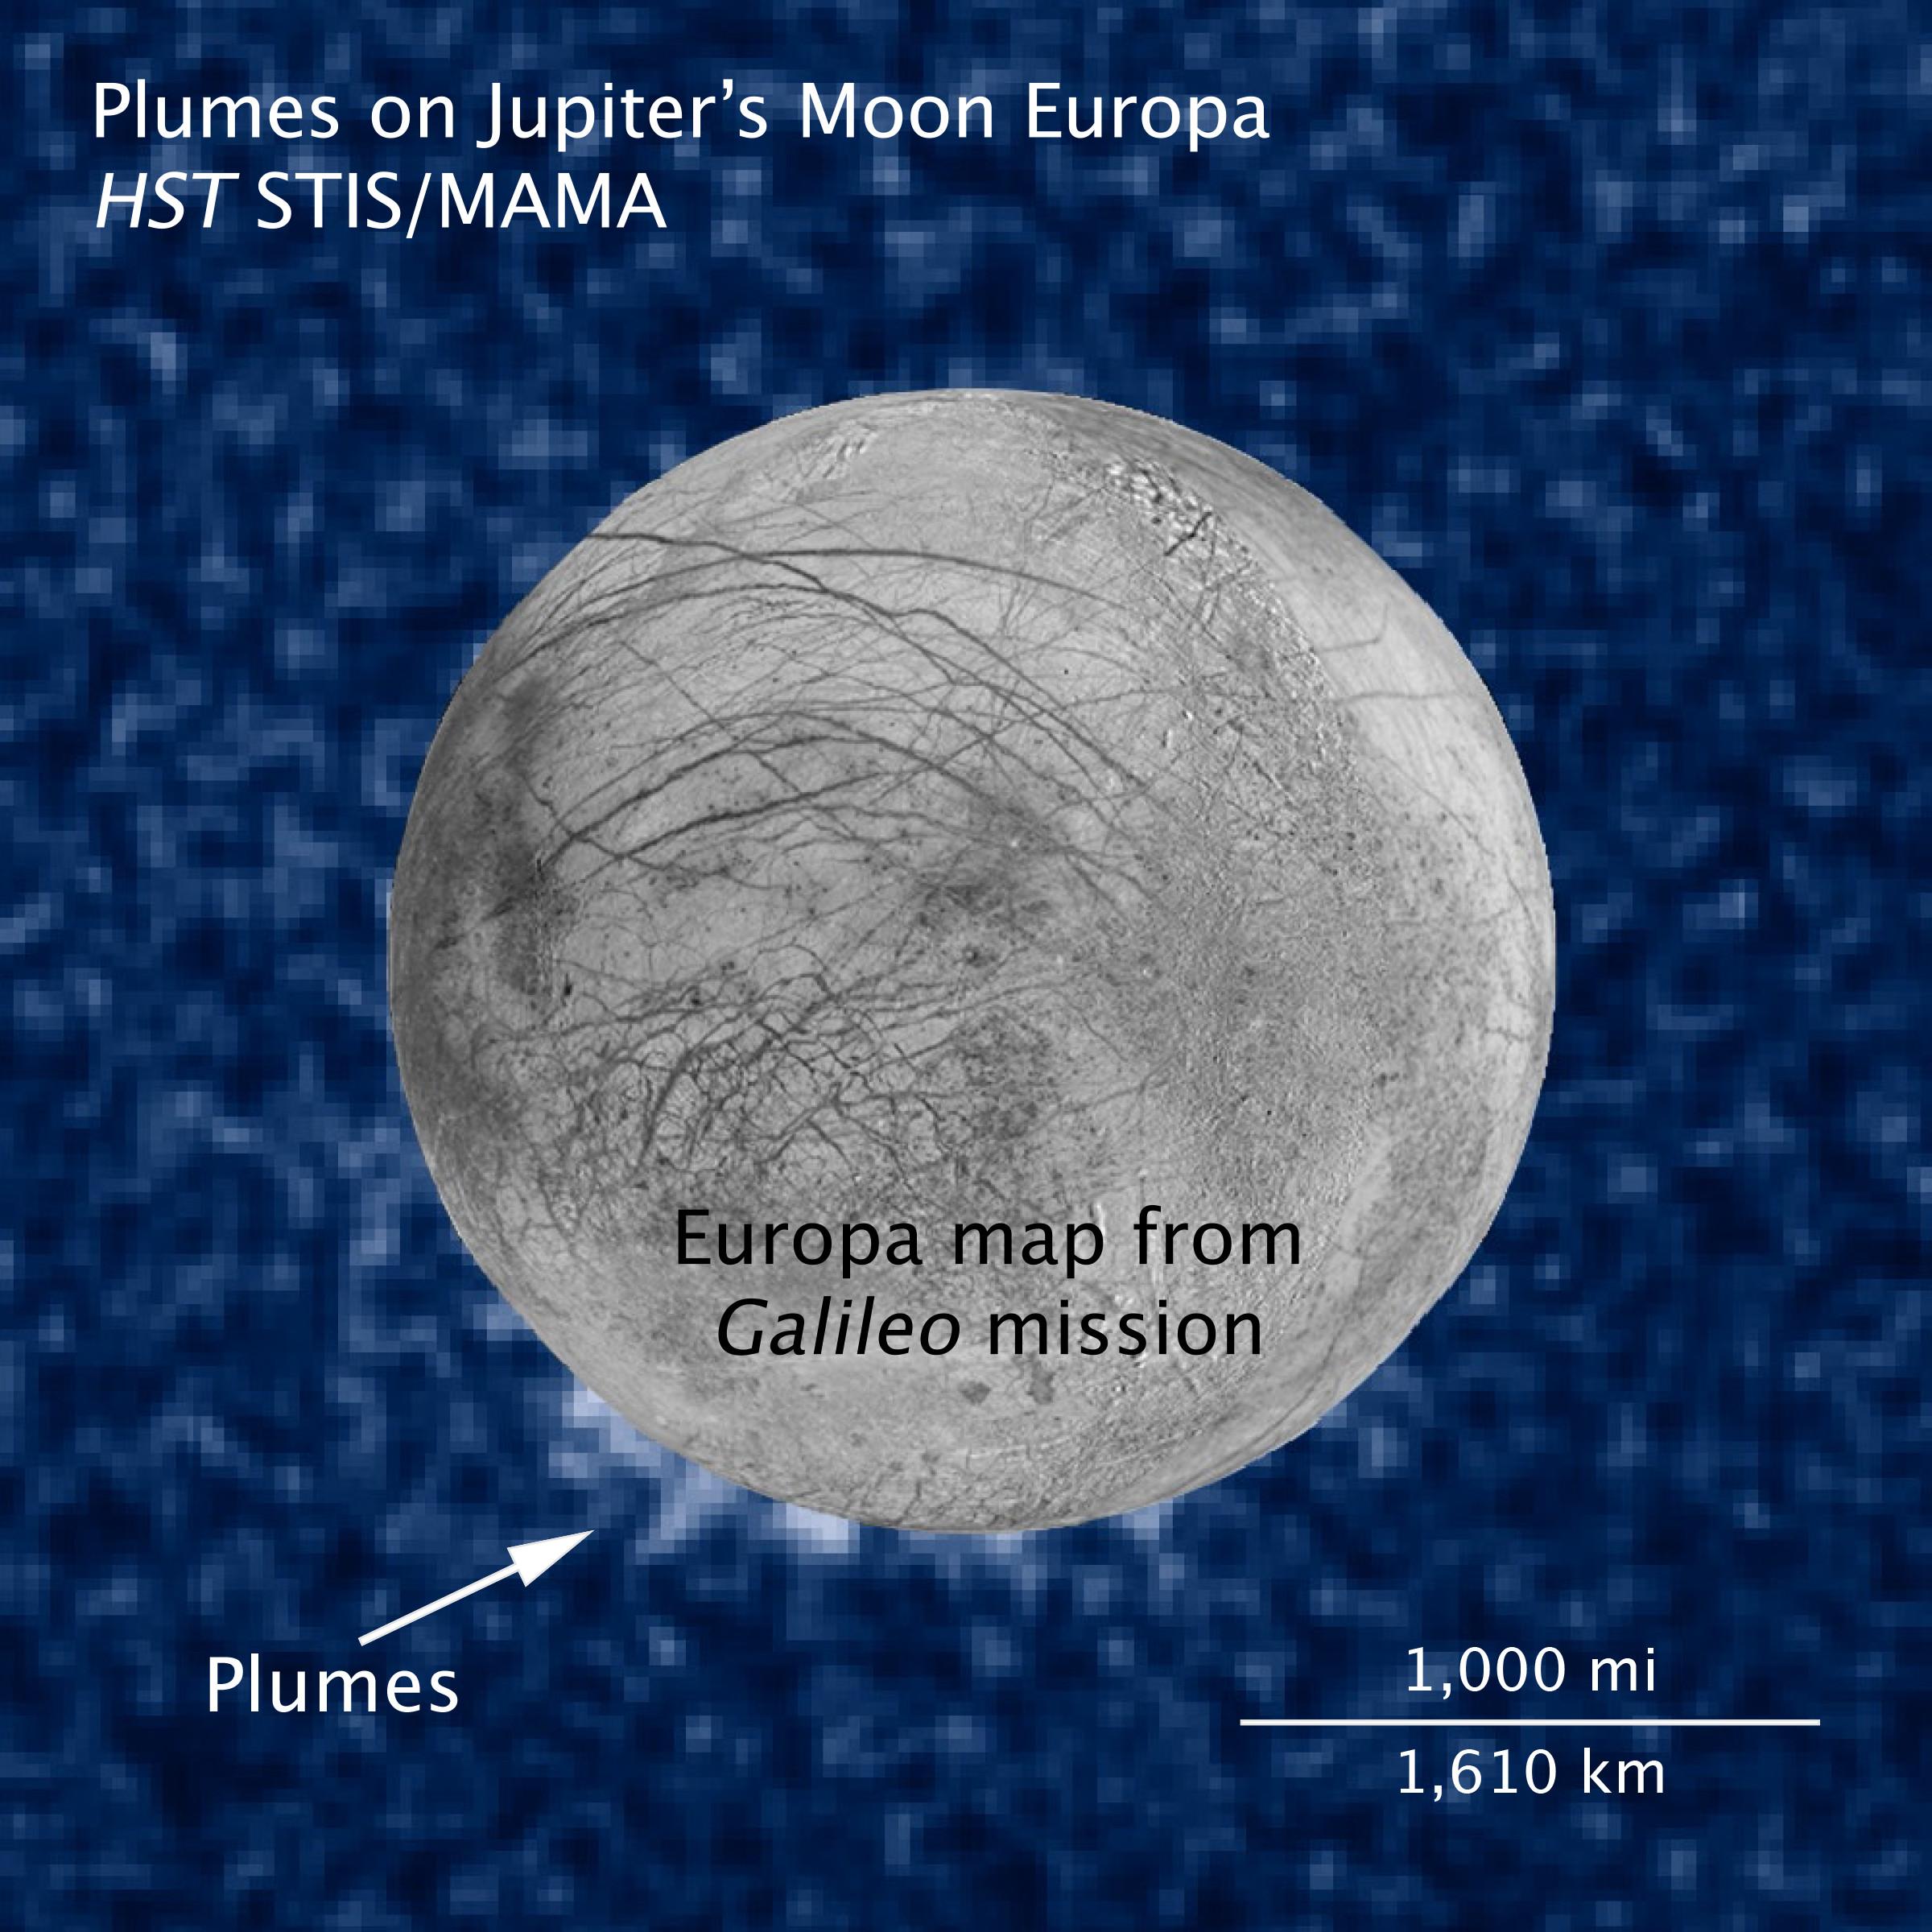 1567214318859-HST_Europa_plumes_opo1633b.jpg